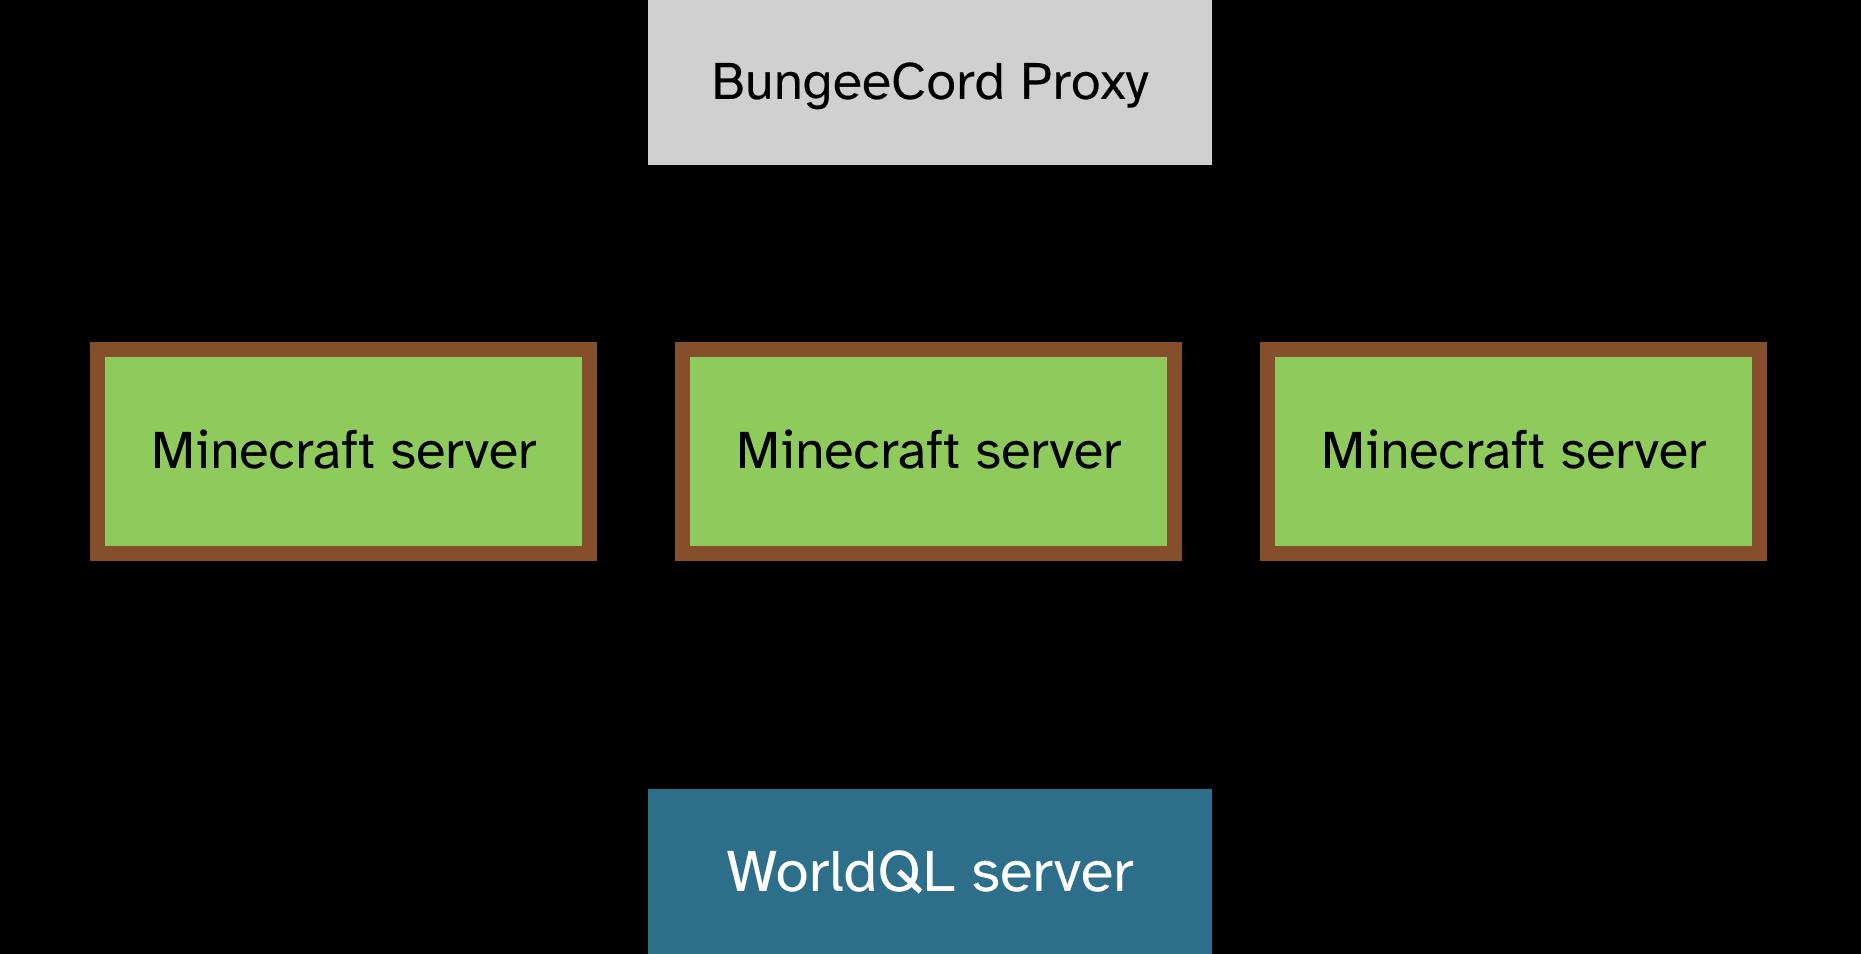 WorldQL architecture diagram